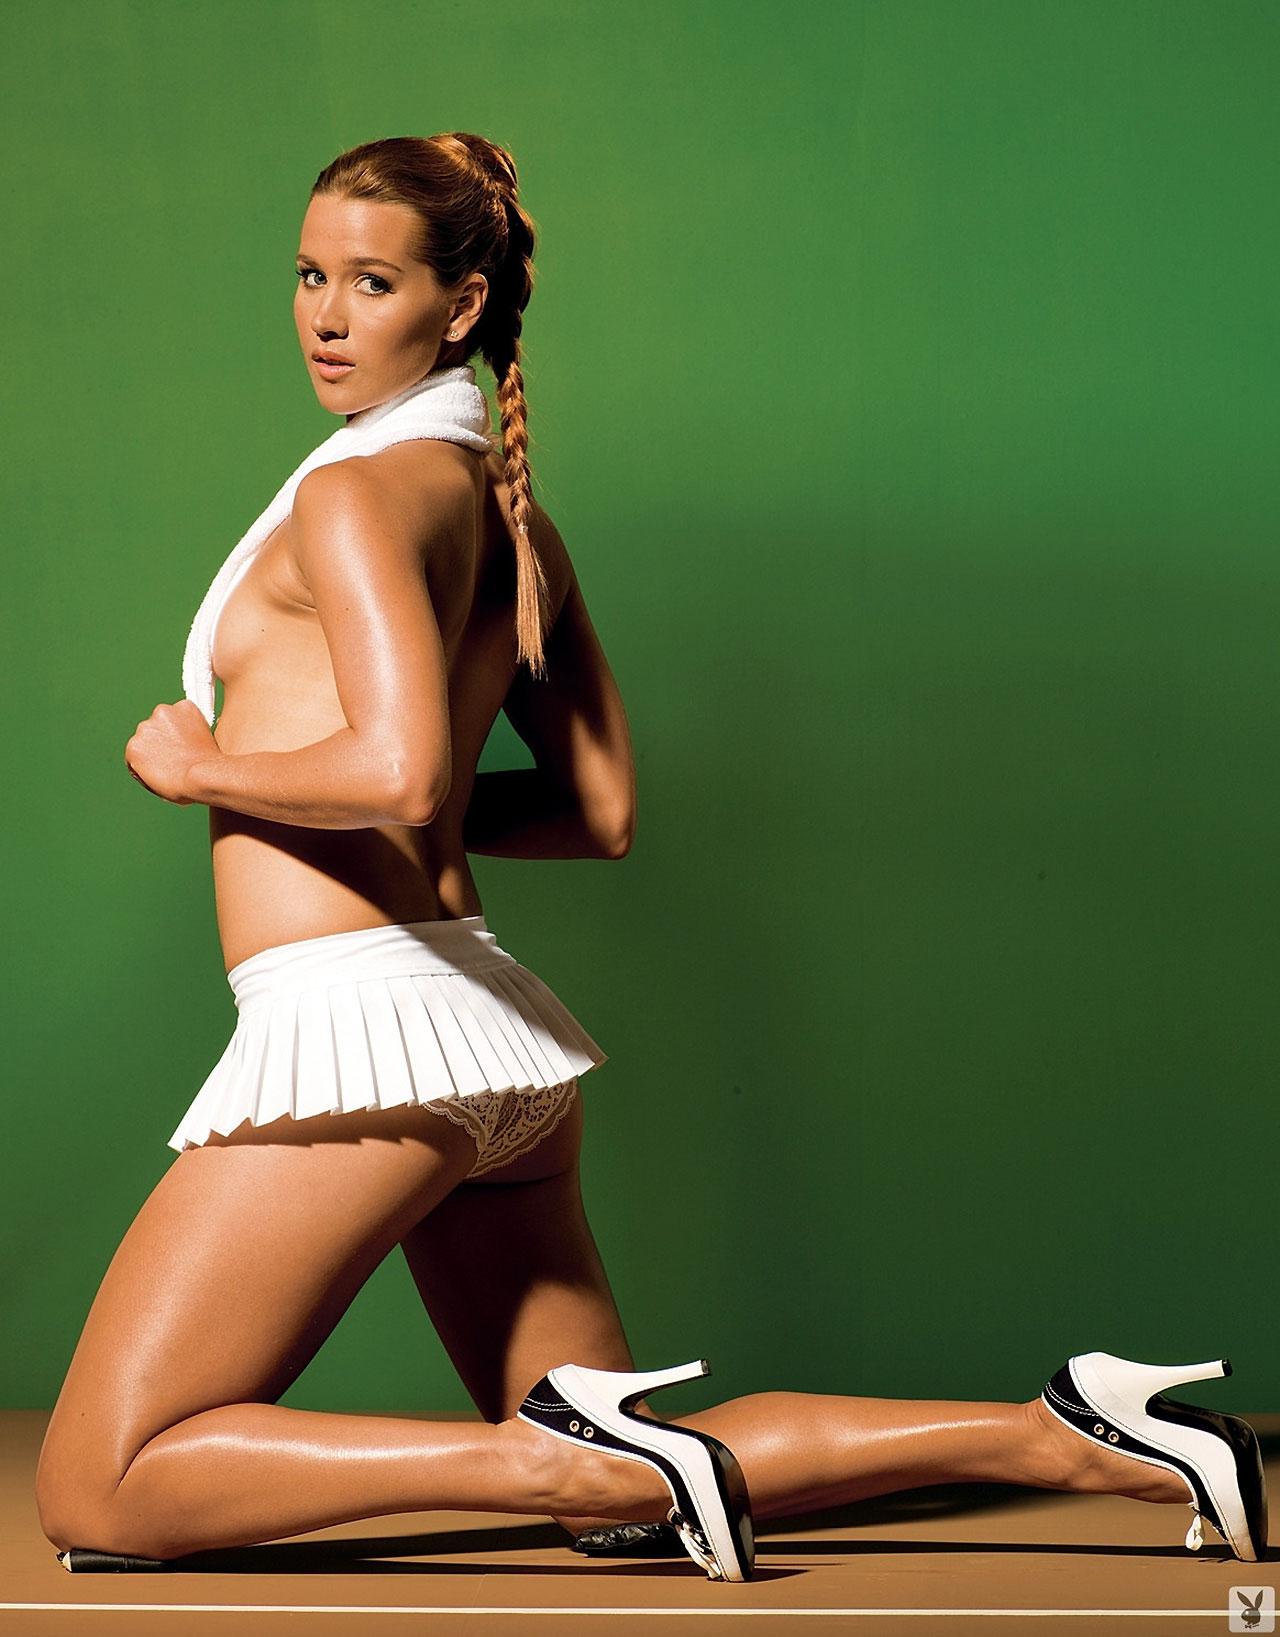 Free Tennis Ashley Harkleroad Nude